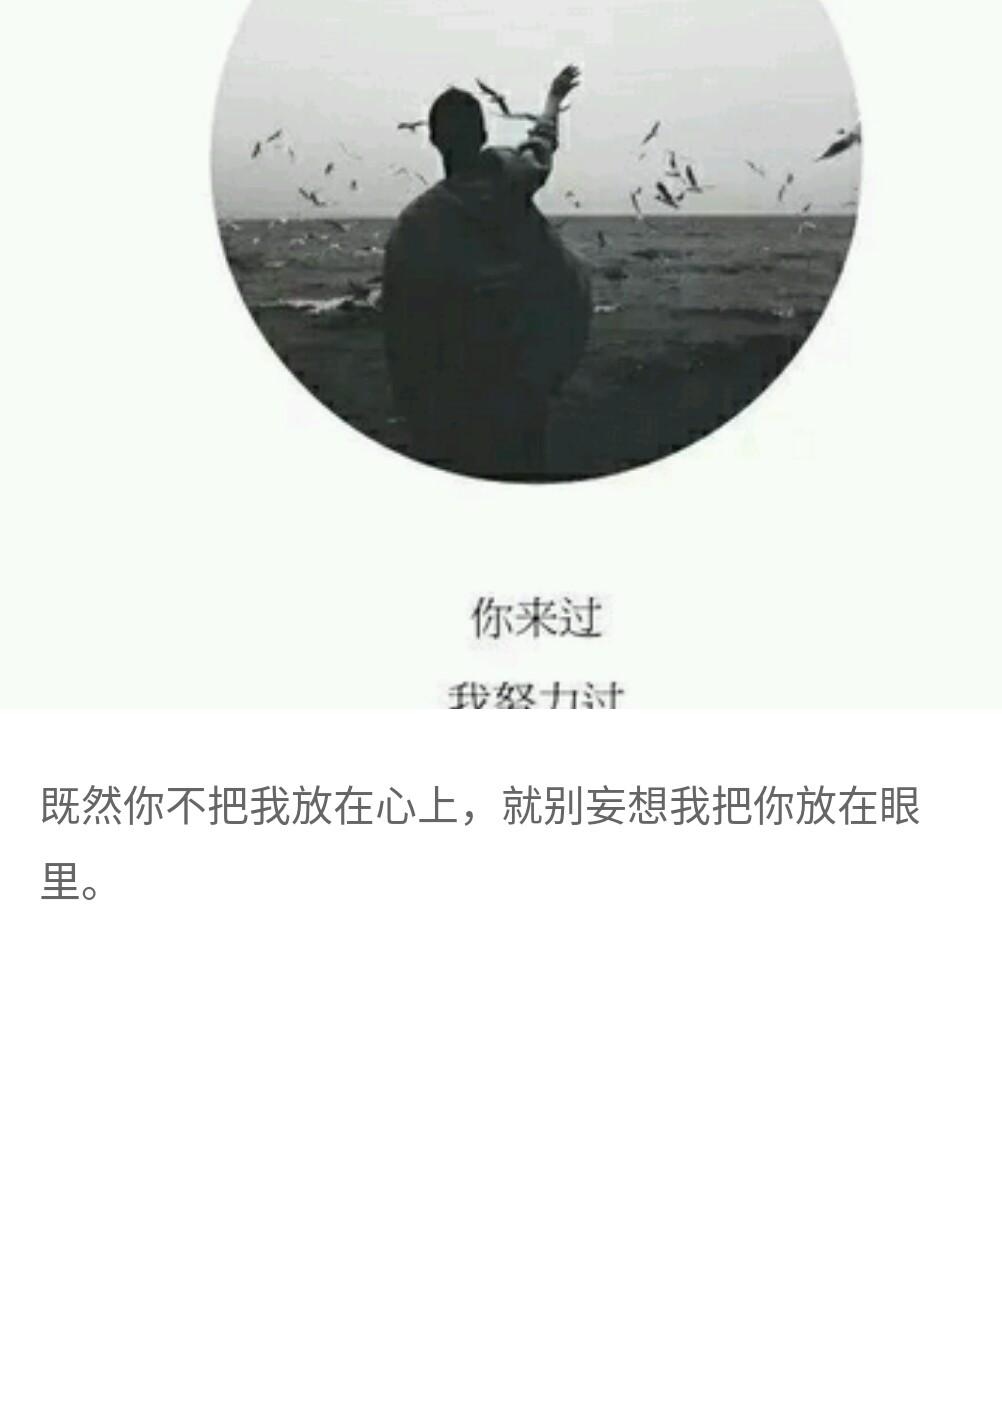 http://www.58100.com/pid/607755.html